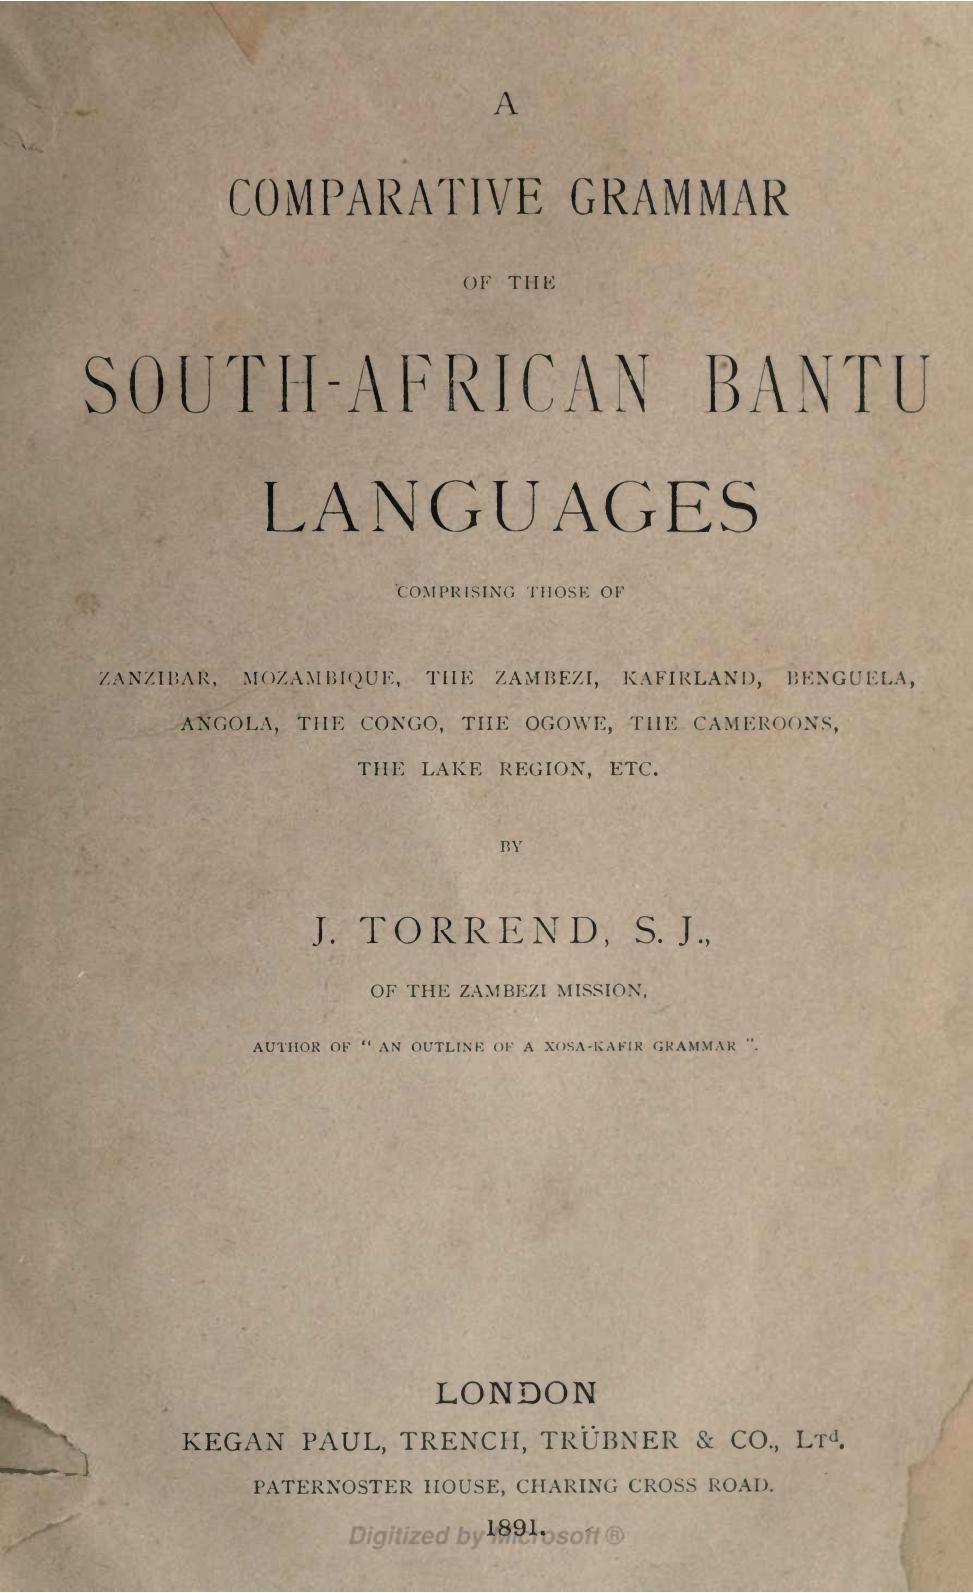 Calaméo - A comparative grammar of the South African Bantu